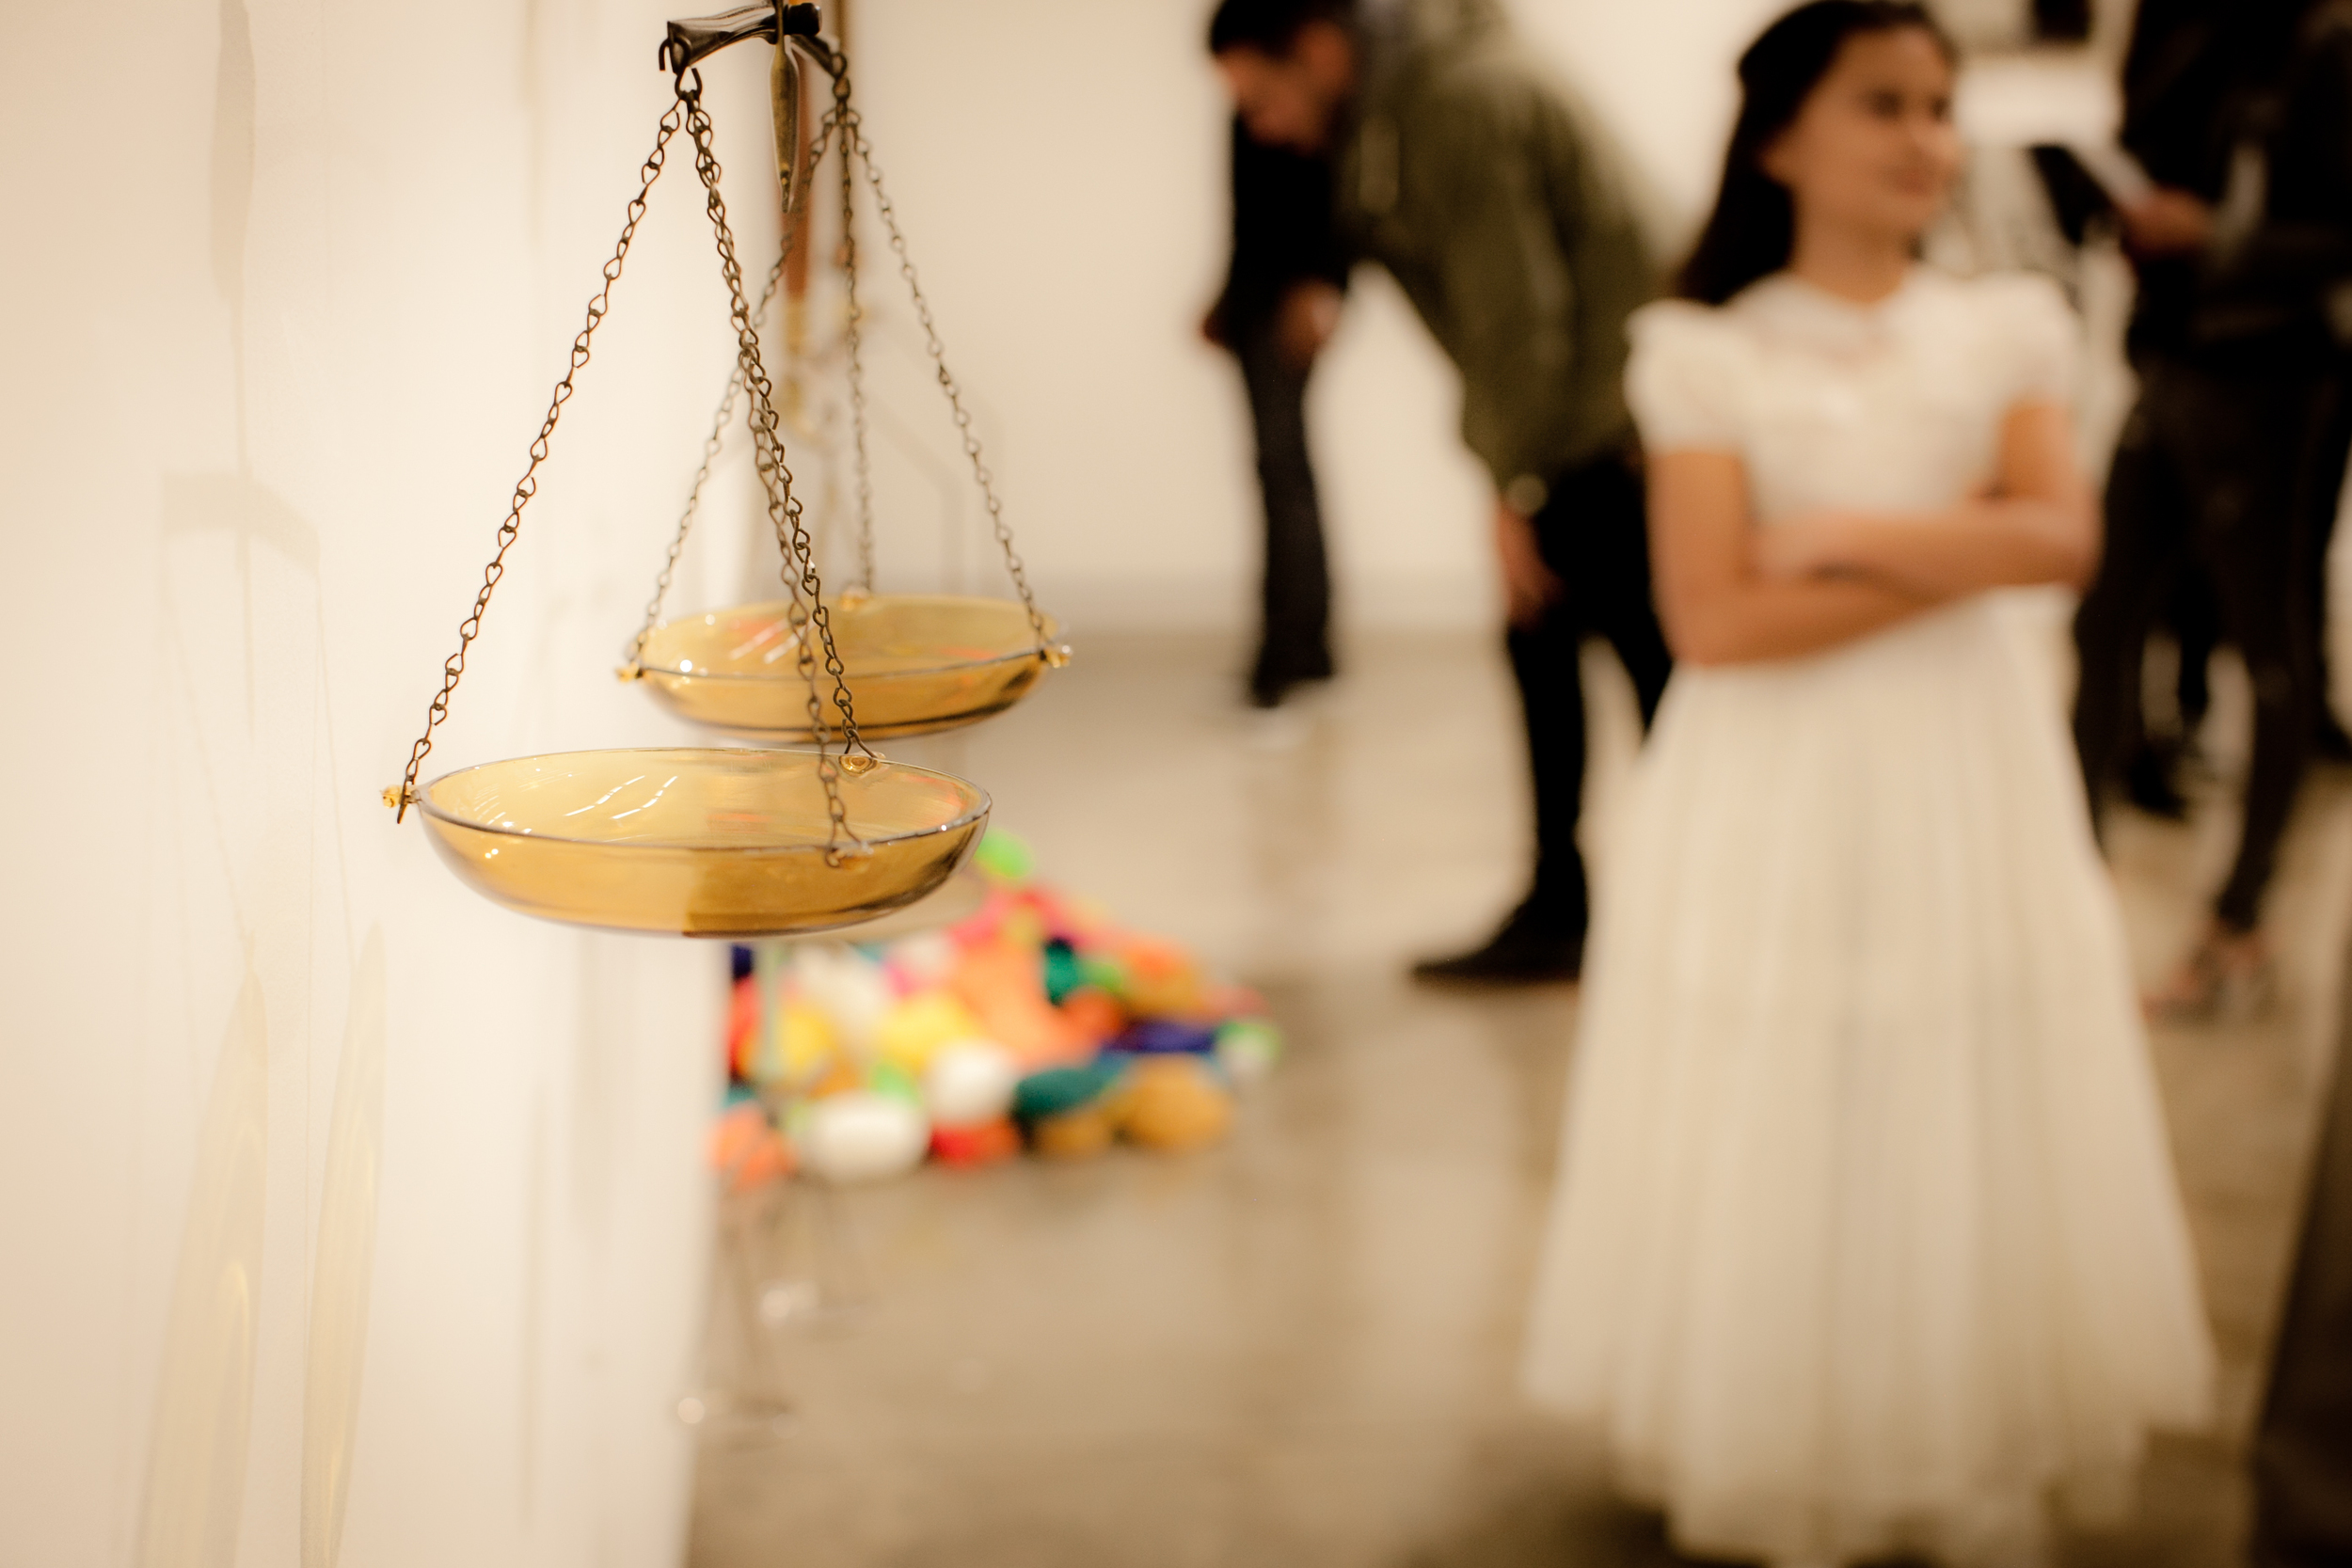 Kavi Gupta West Loop Expo Chicago Mickalene Thomas Glenn Kaino modern art sculpture chicago-0007.jpg